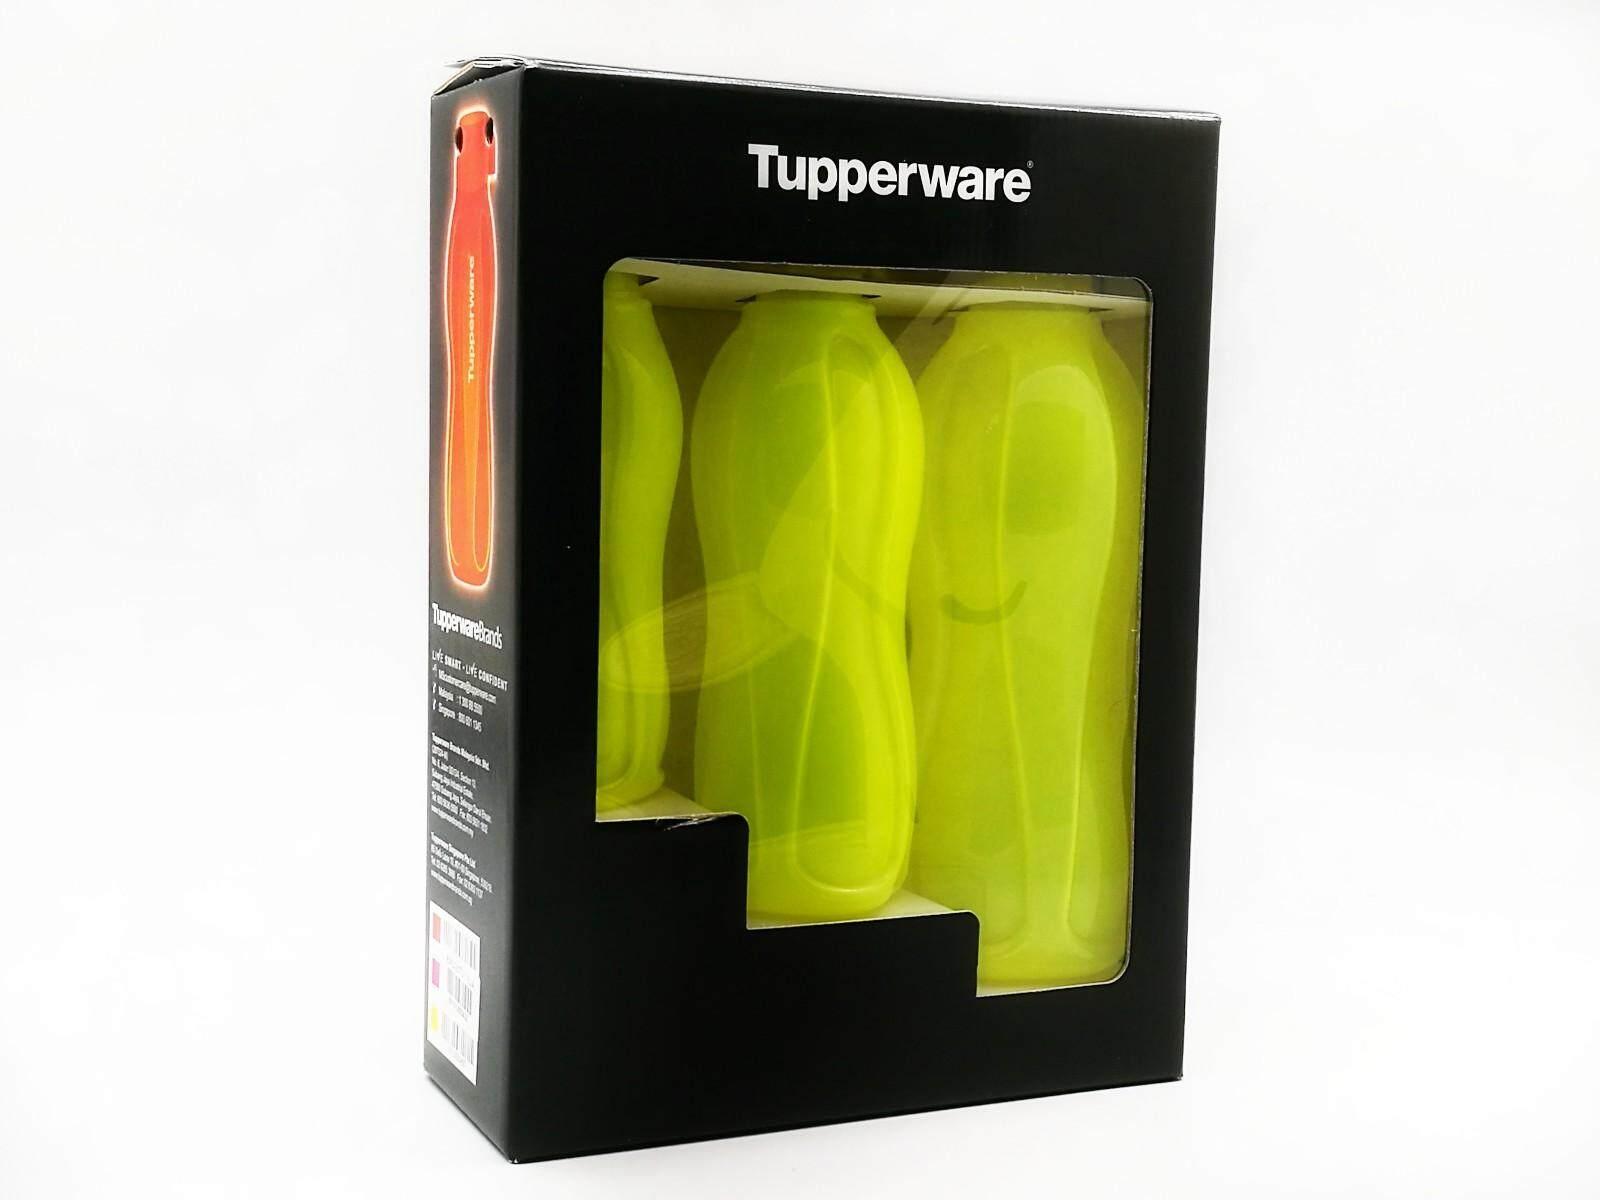 Features Tupperware Neon Eco Yellow Bottles 3pcs Set Dan Harga 310ml 4 Bottle Detail Gambar Terbaru